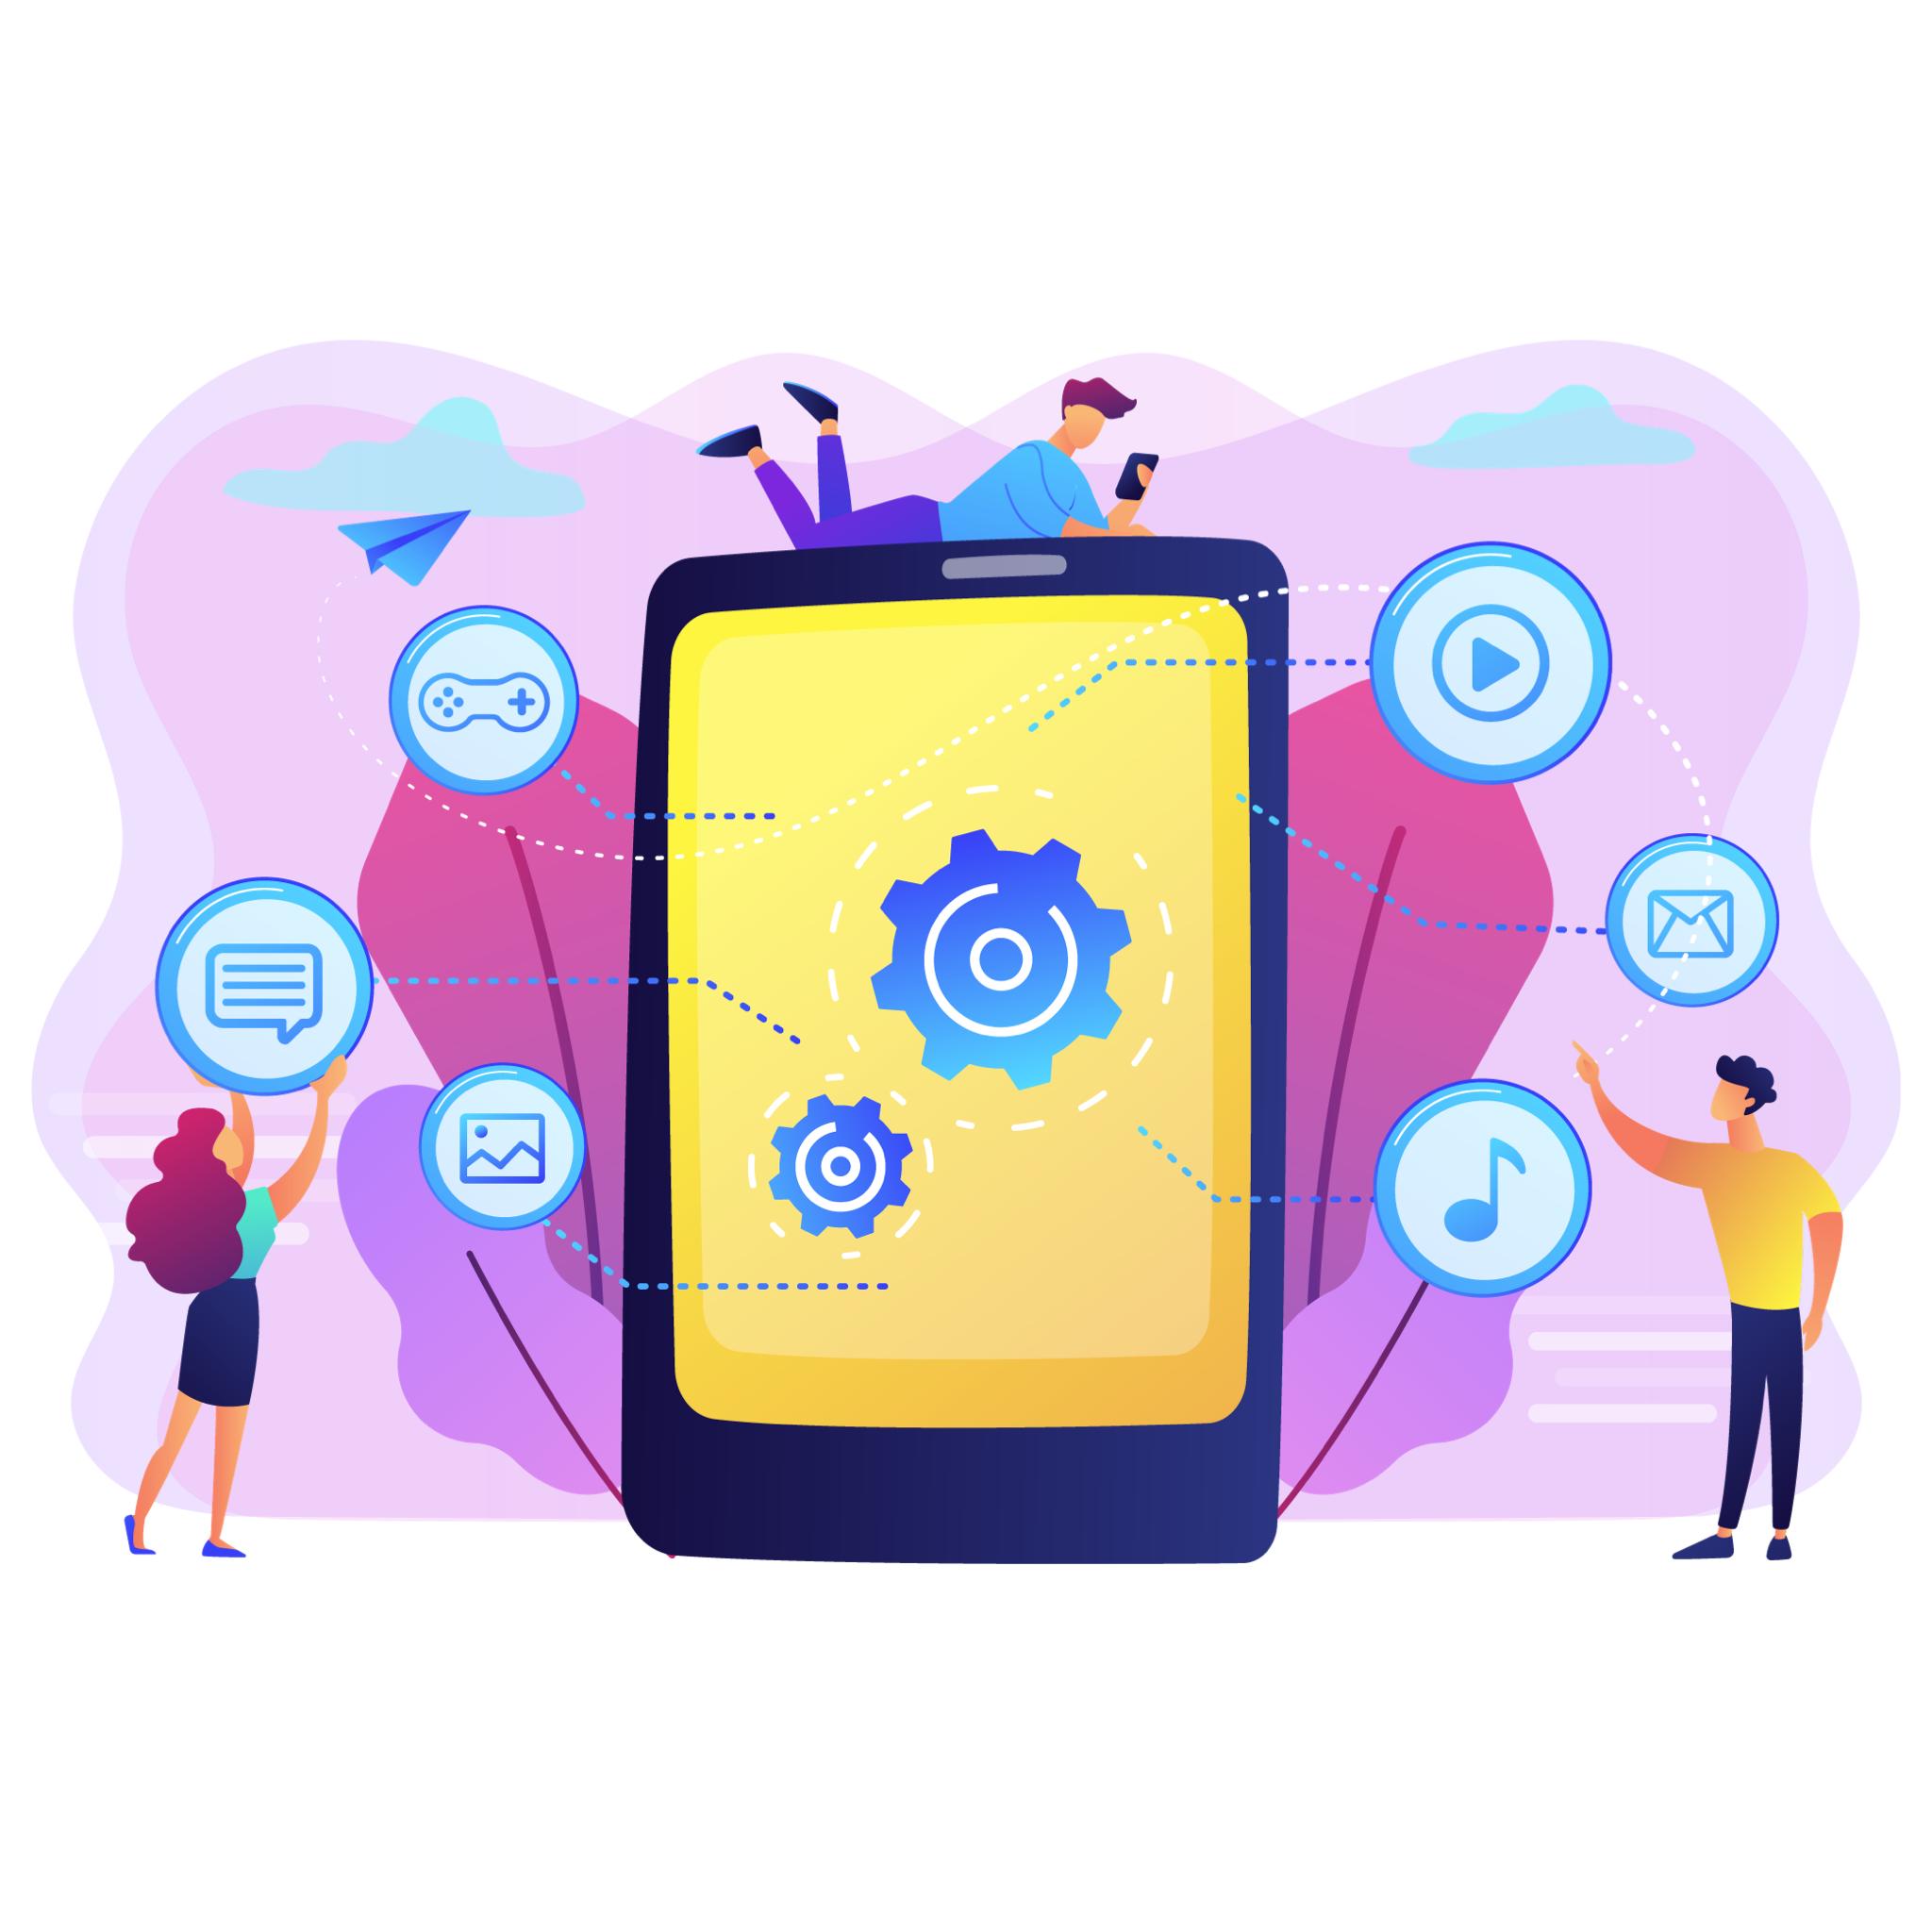 Laboratorio de Apps